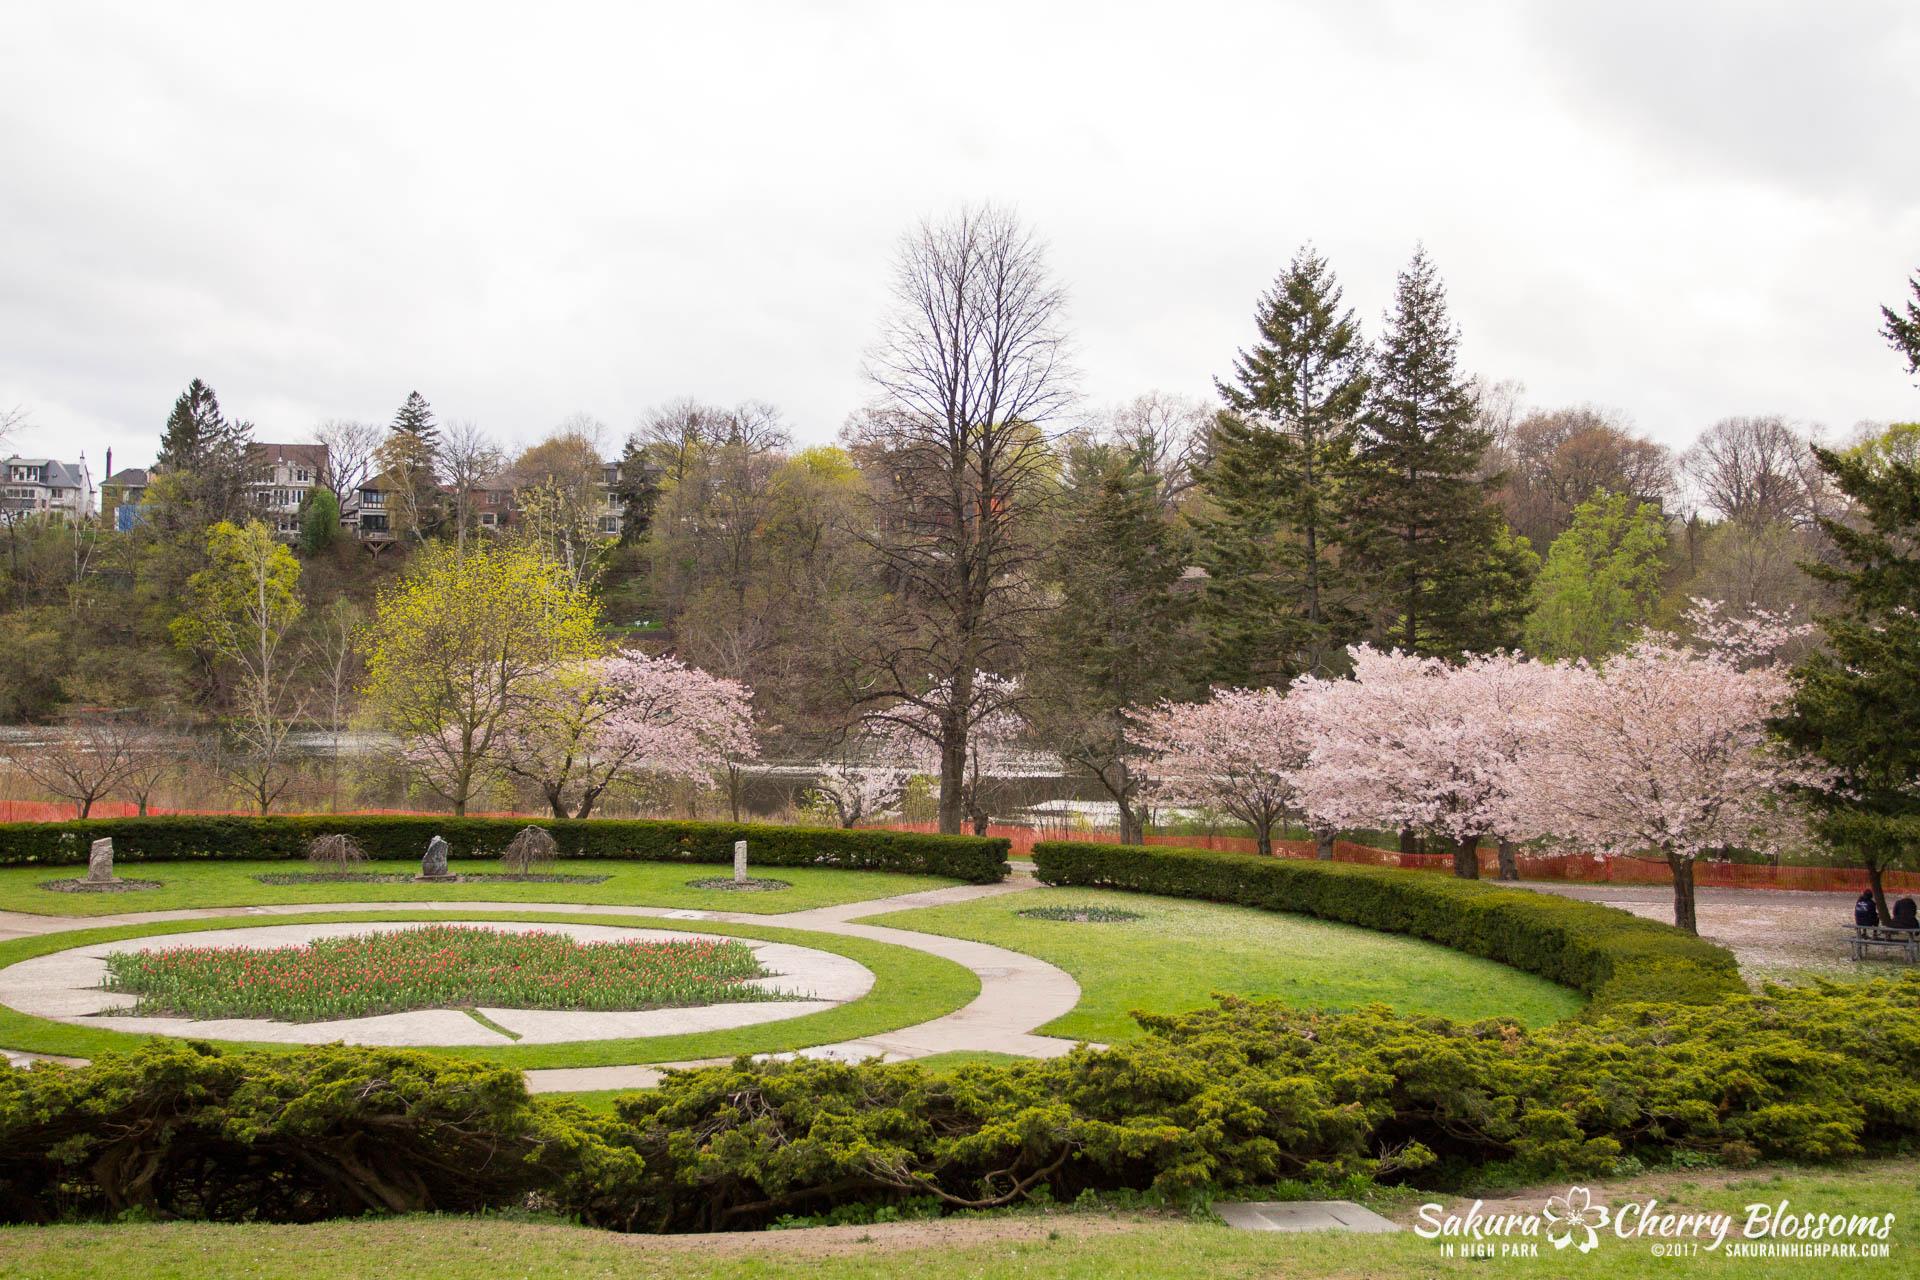 Sakura-Watch-May-2-2017-cherry-blossoms-falling-in-High-Park-218.jpg